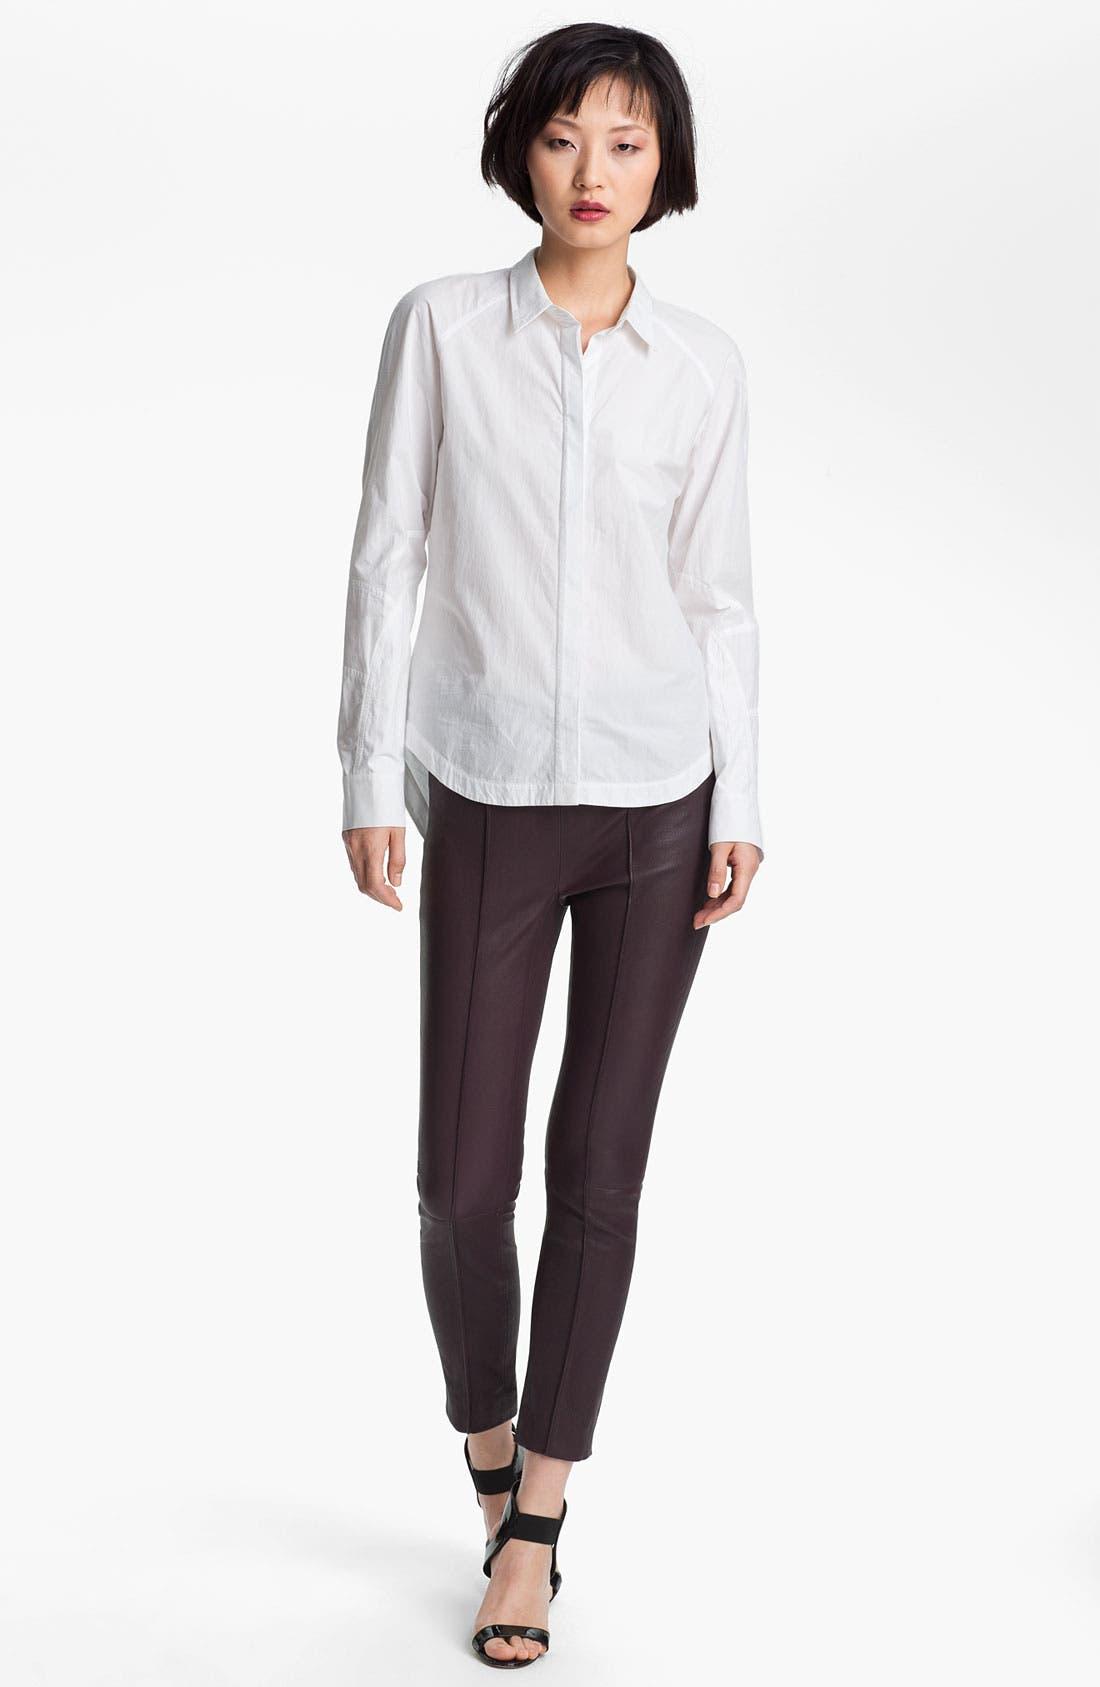 Main Image - 3.1 Phillip Lim Shirt & Leather Pants